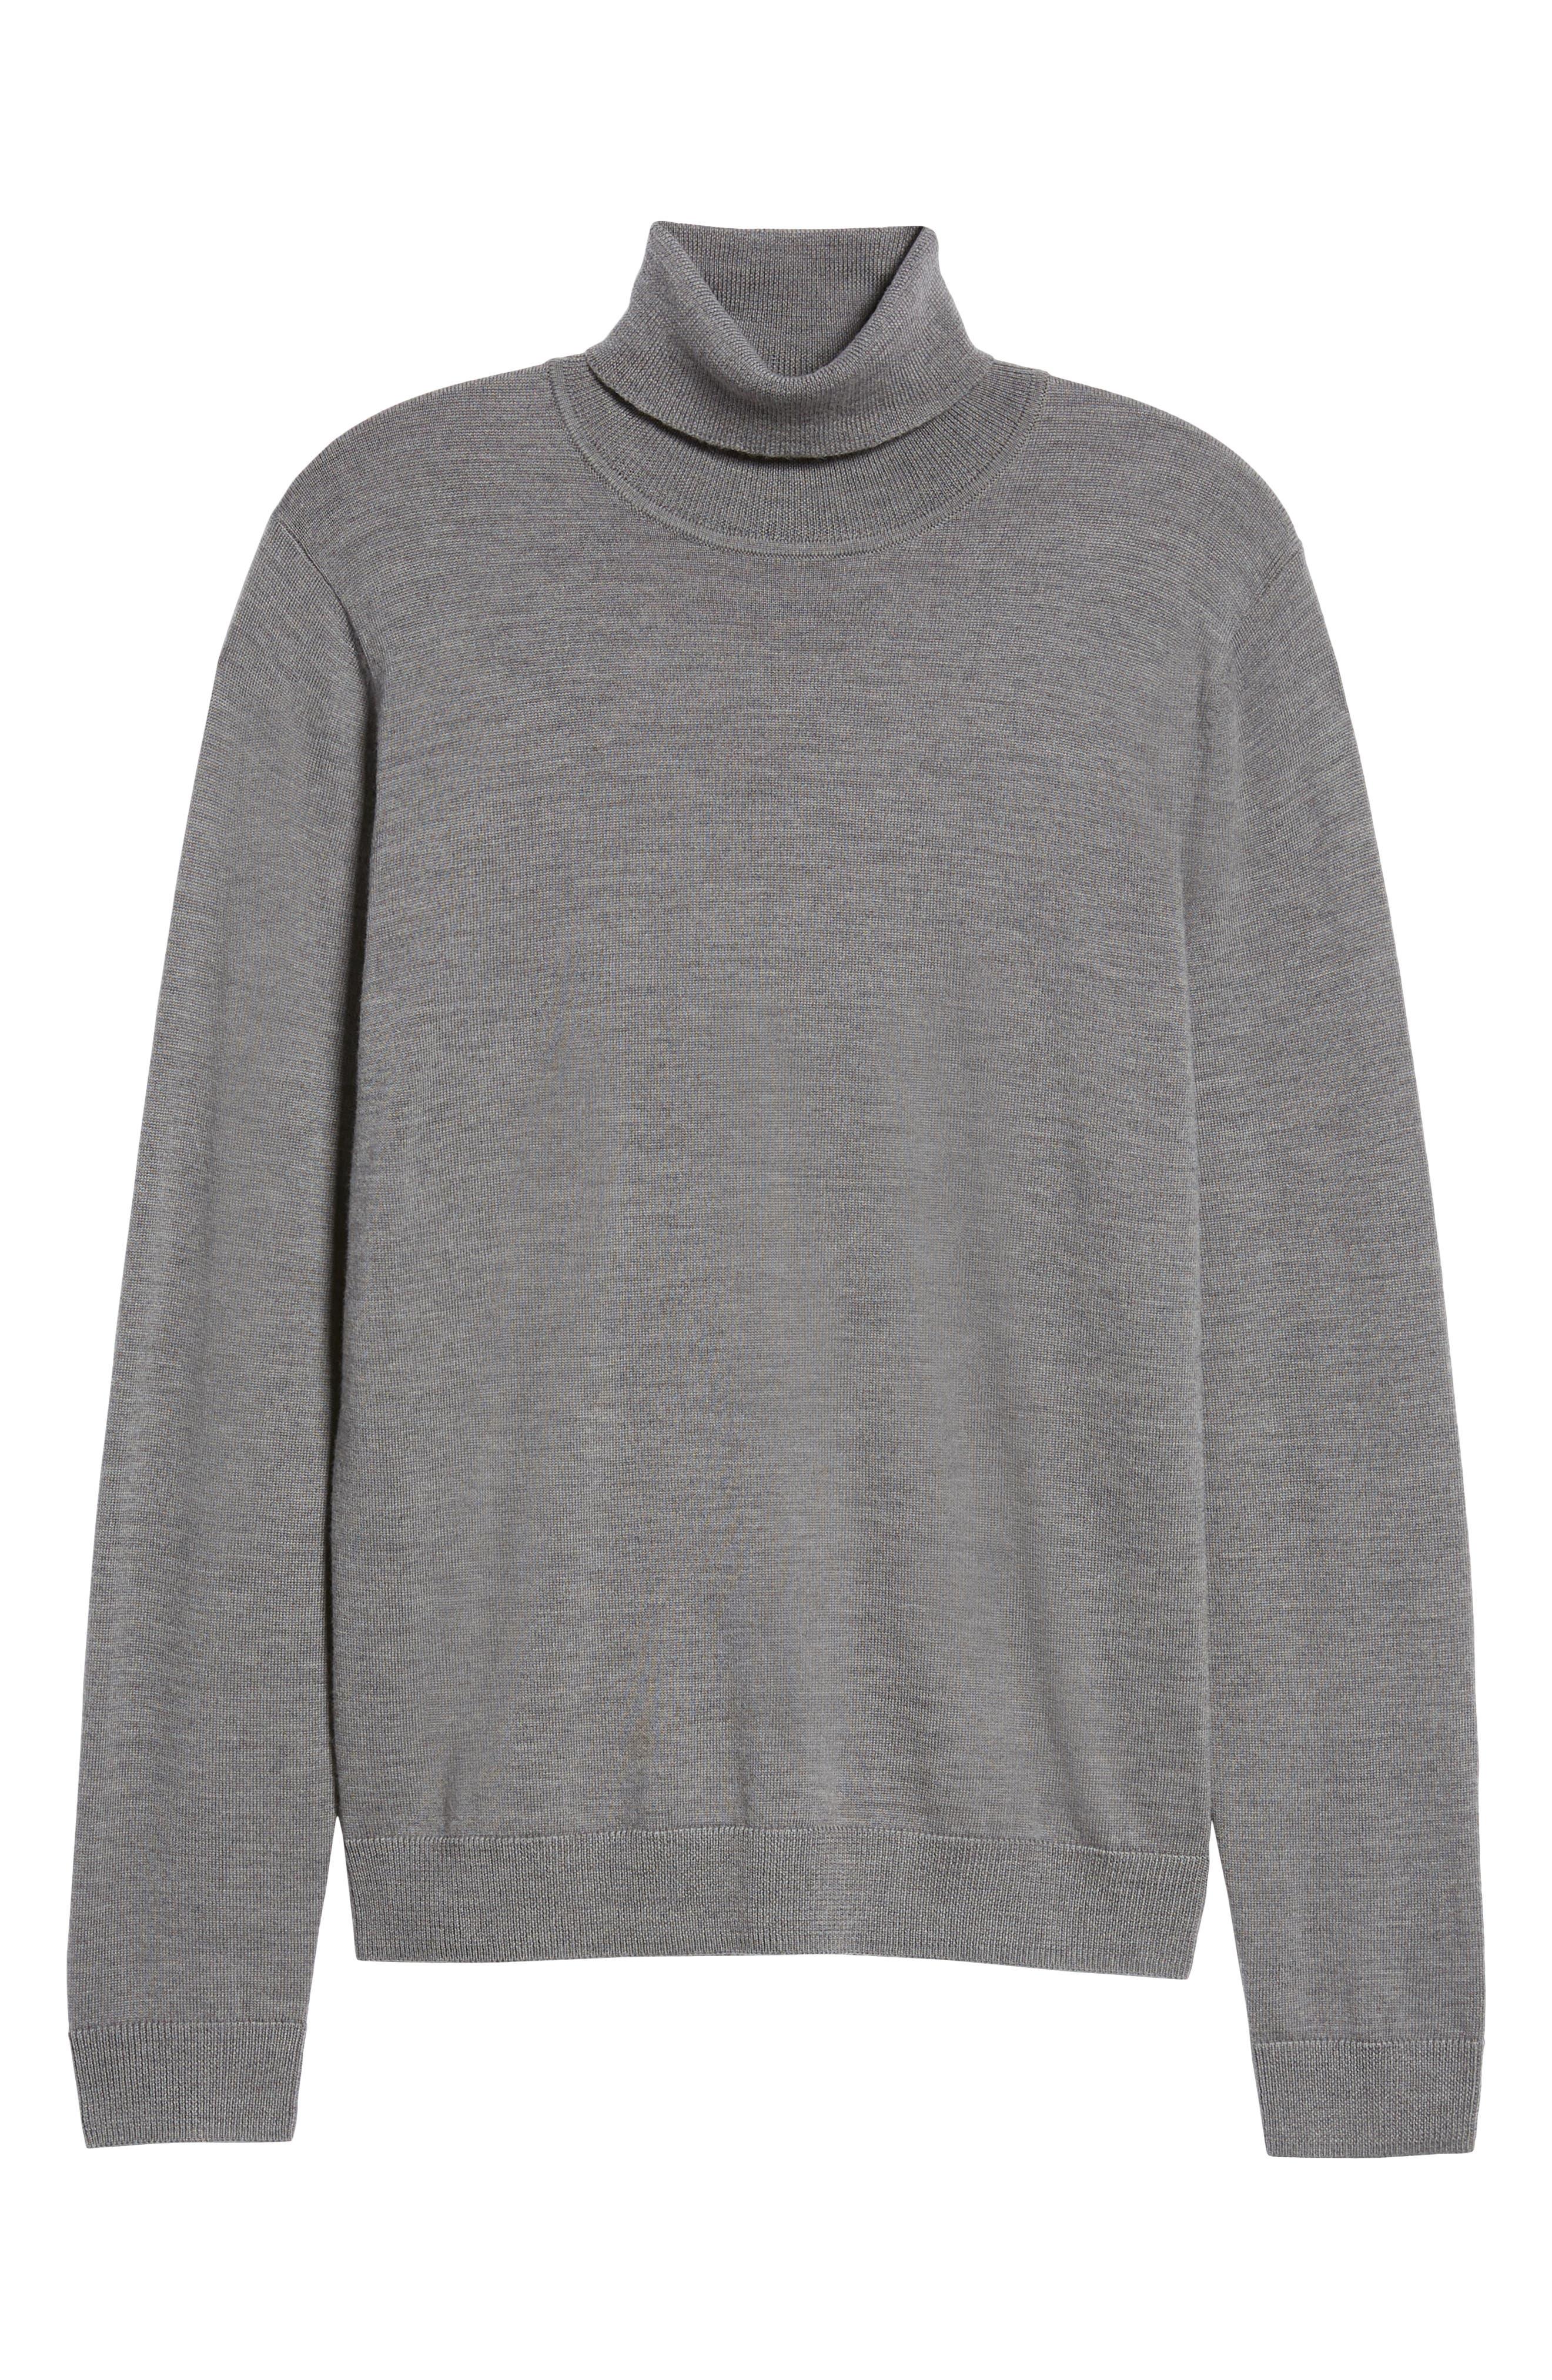 Merino Wool Turtleneck Sweater,                             Alternate thumbnail 32, color,